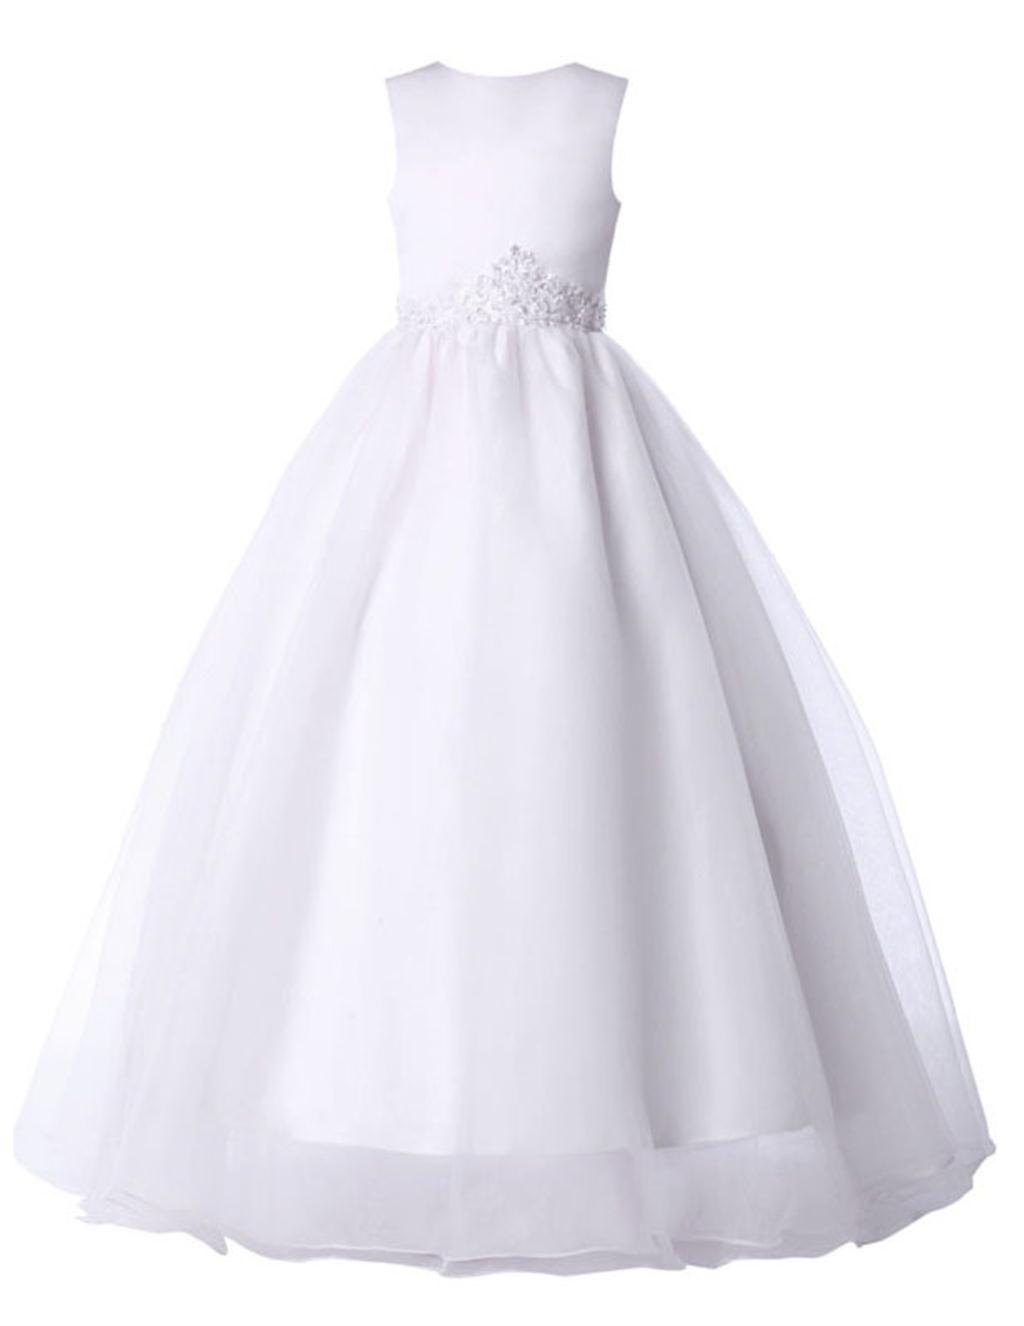 Grace Karin Flower Girl Dresses For Weddings 2016 First Girls Communion Kids Dream White Pageant 4491 Wedding Gowns Bridal